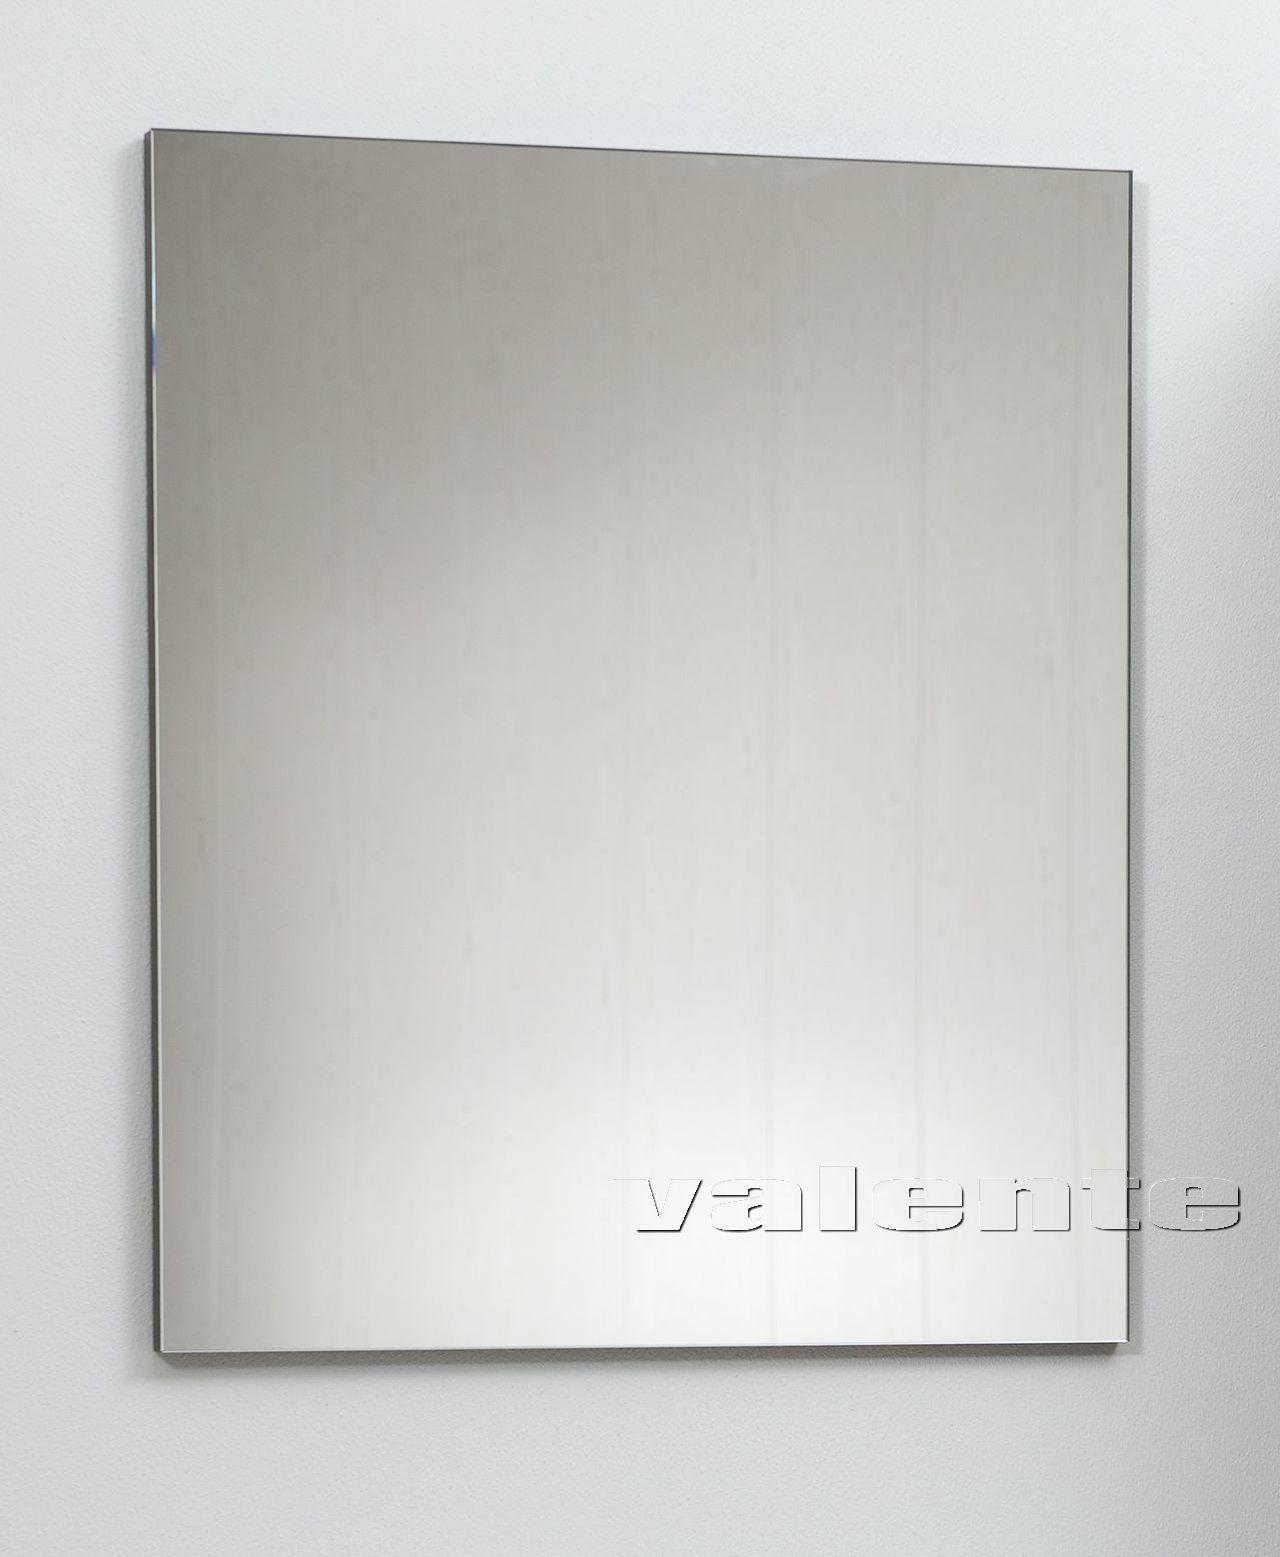 Зеркало в душ Massima (Массима) 50х60 ФОТО